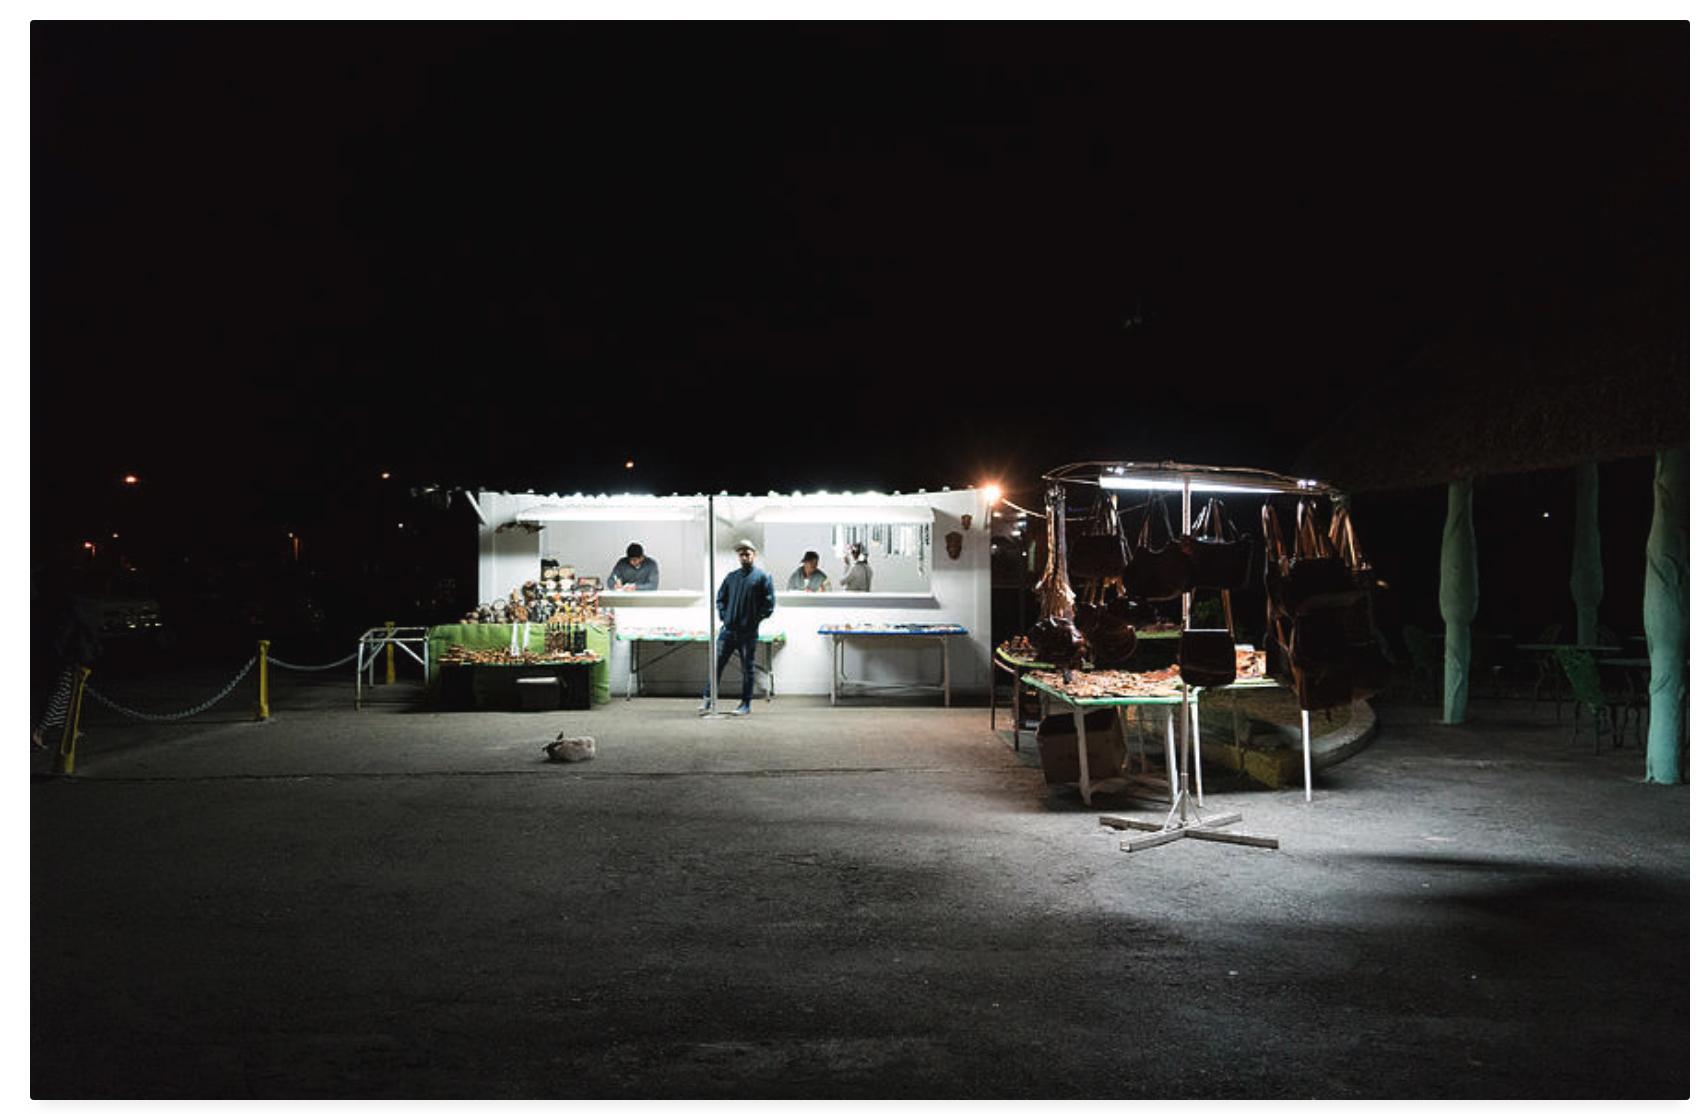 Evening Sales by Sharon Popek